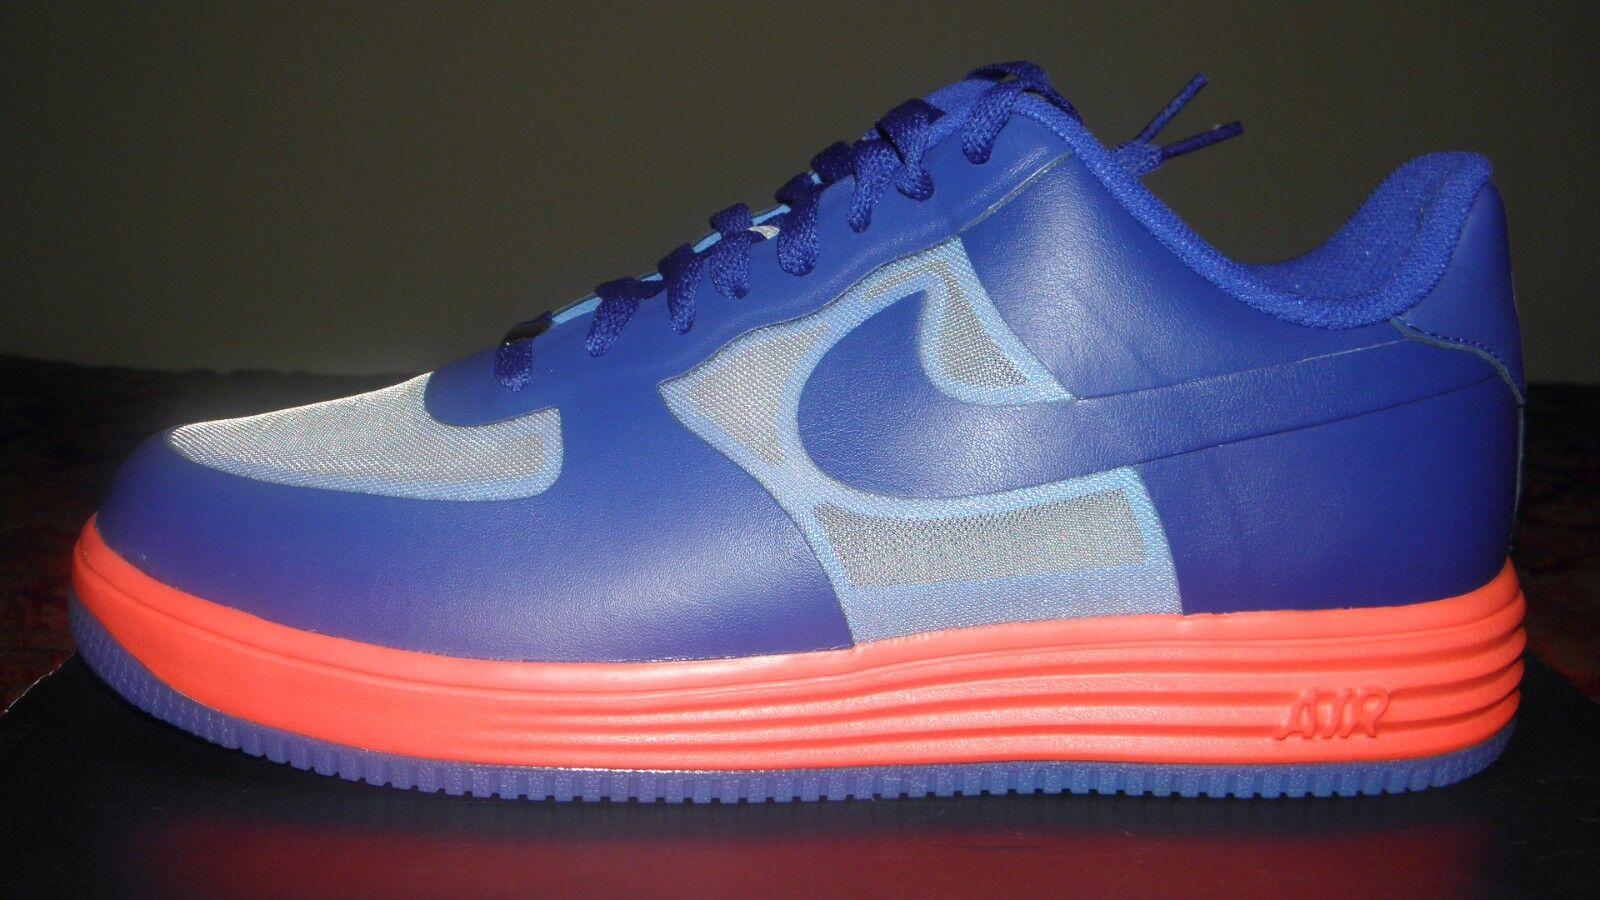 Brand New Nike Lunar Force 1 Fuse Lthr Size 12 Grey/Blue-Red 599839 001